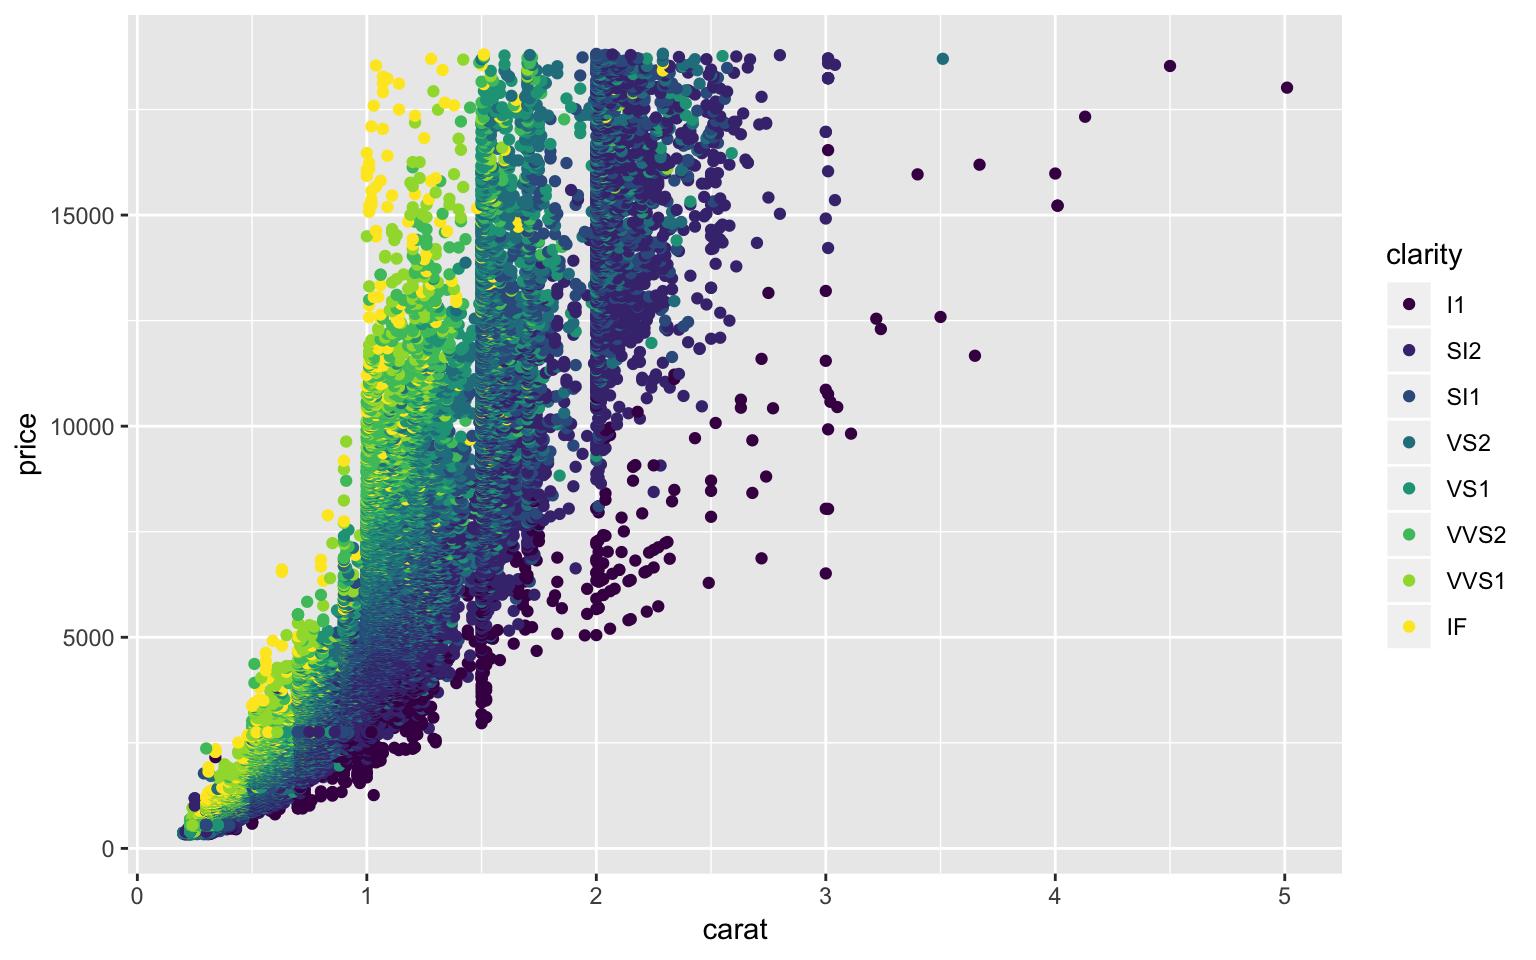 diamonds plot with ggplot2.